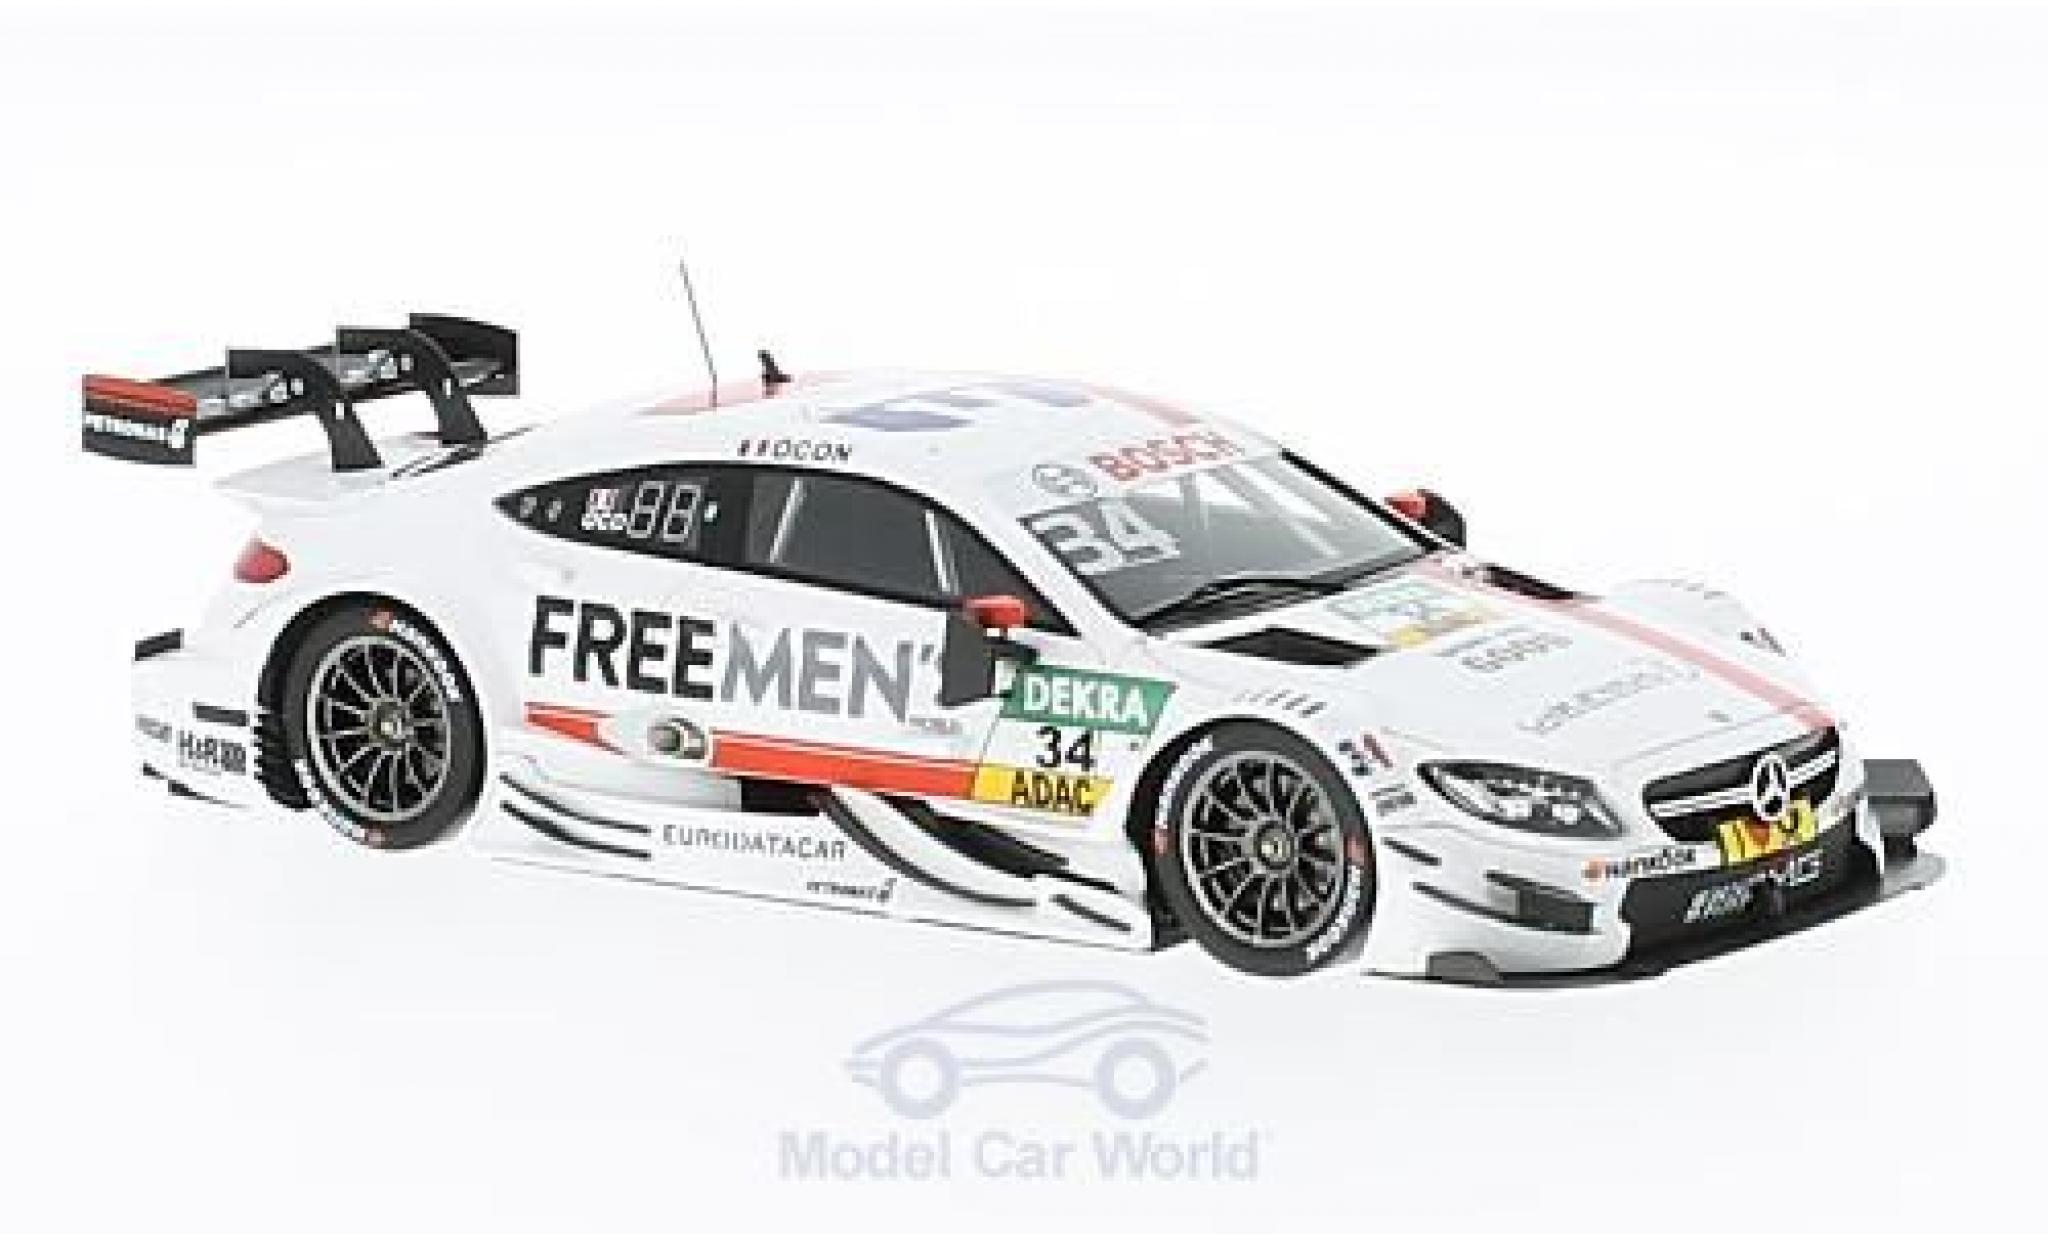 Mercedes Classe C DTM 1/43 Spark AMG C63 DTM No.34 -AMG DTM Team ART Freemens DTM 2016 E.Ocon